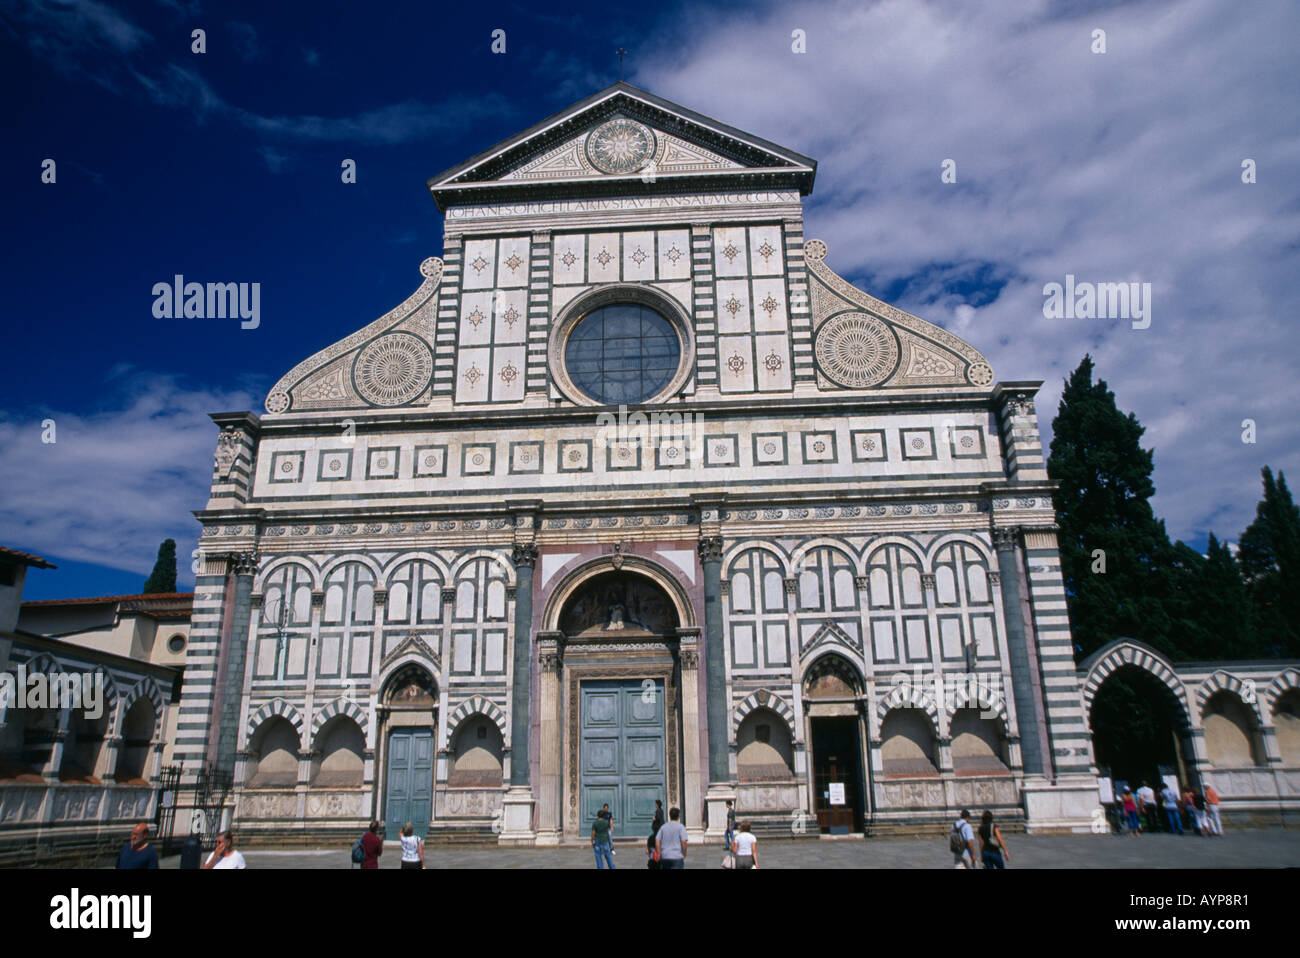 Italia Toscana Firenze Santa Maria Novella Esterno Facciata In Marmo